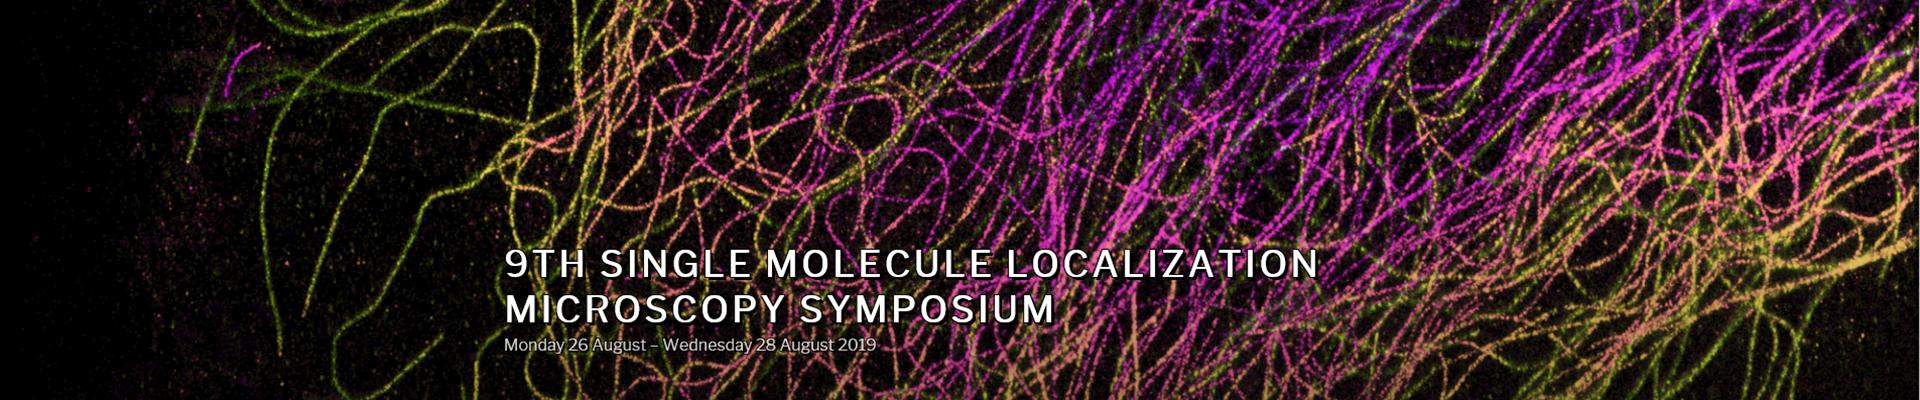 9th Single Molecule Localization Microscopy Symposium